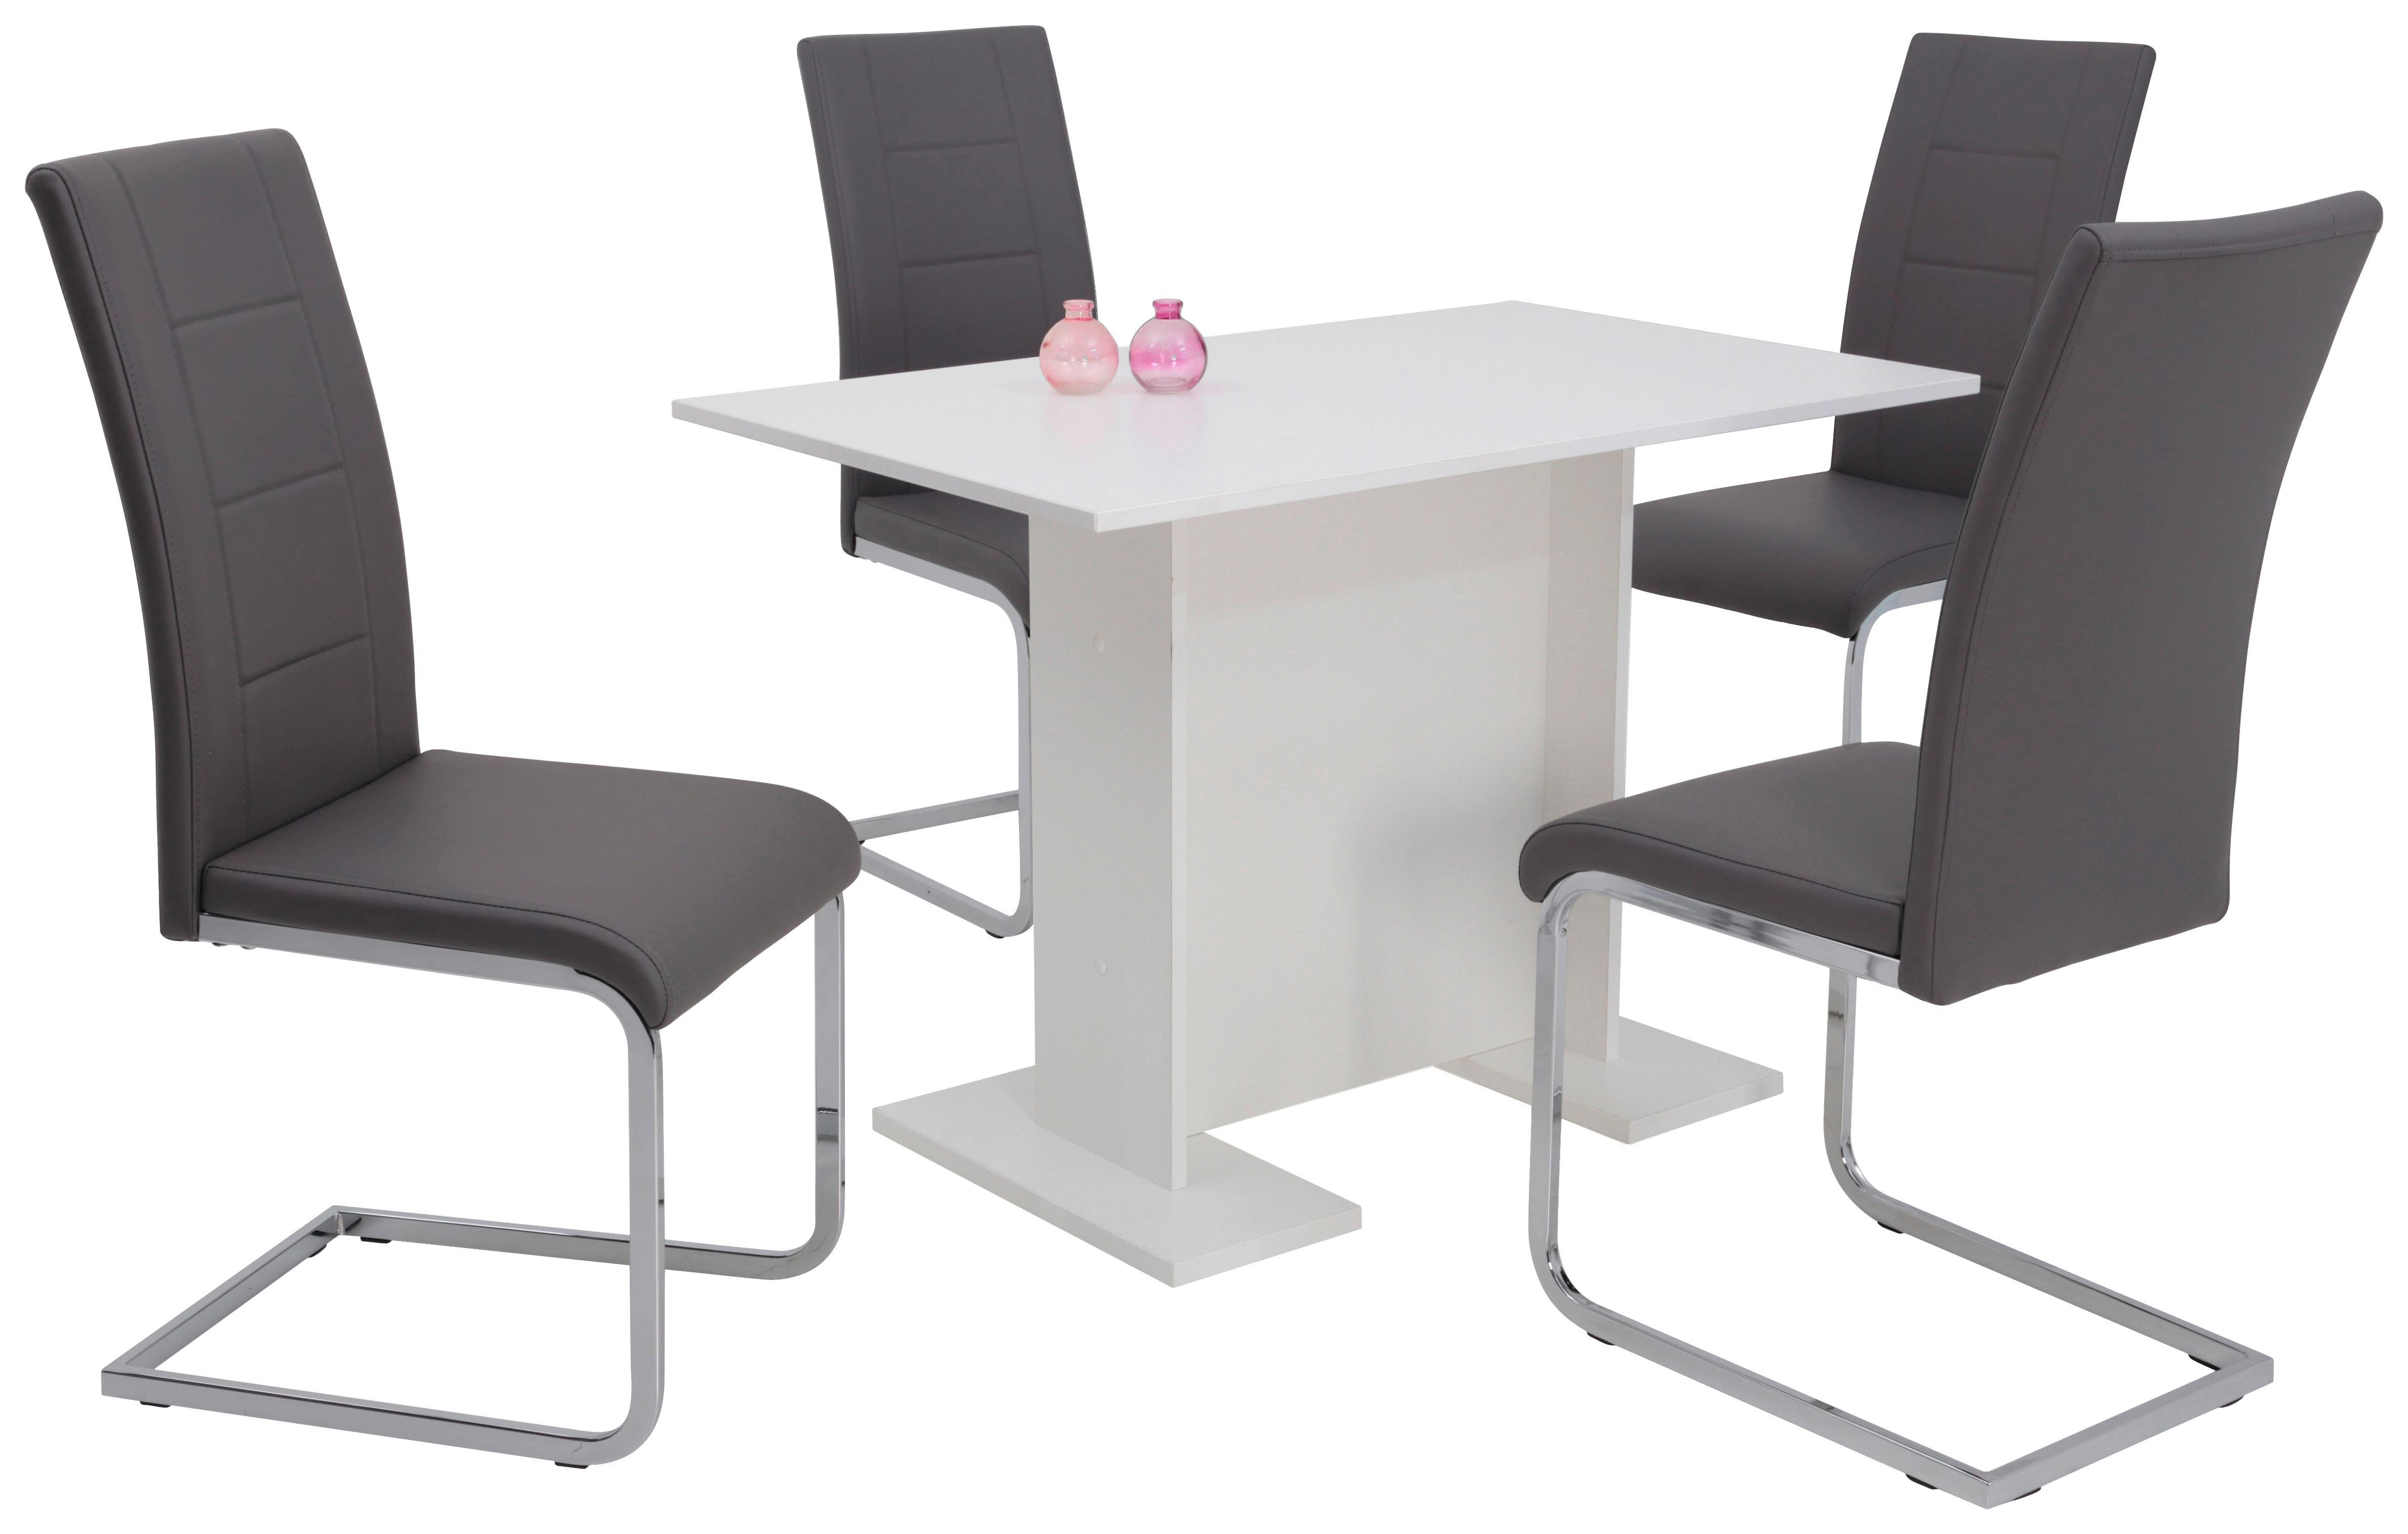 eckbank grau top gemtlich sitzbank cm eckbank x cm kunstleder grau woody with eckbank grau. Black Bedroom Furniture Sets. Home Design Ideas